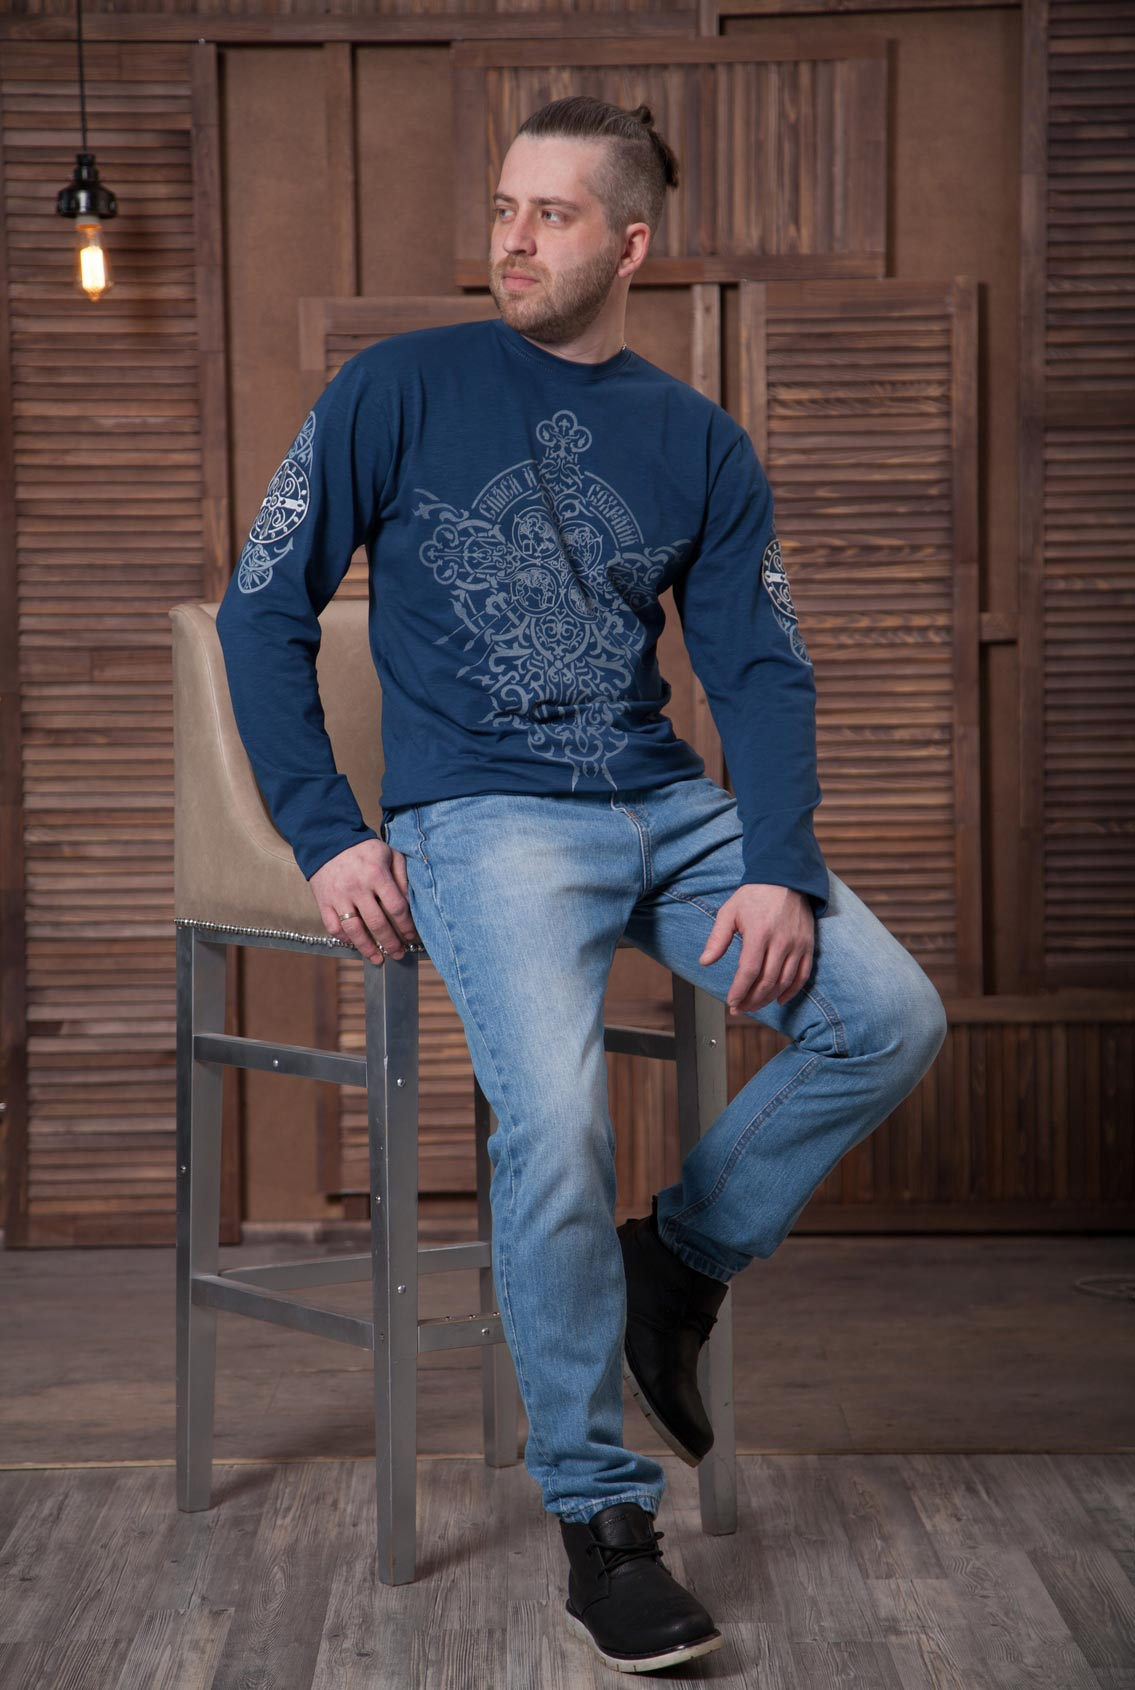 лонгслив Спаси и сохрани, long sleeve shirt